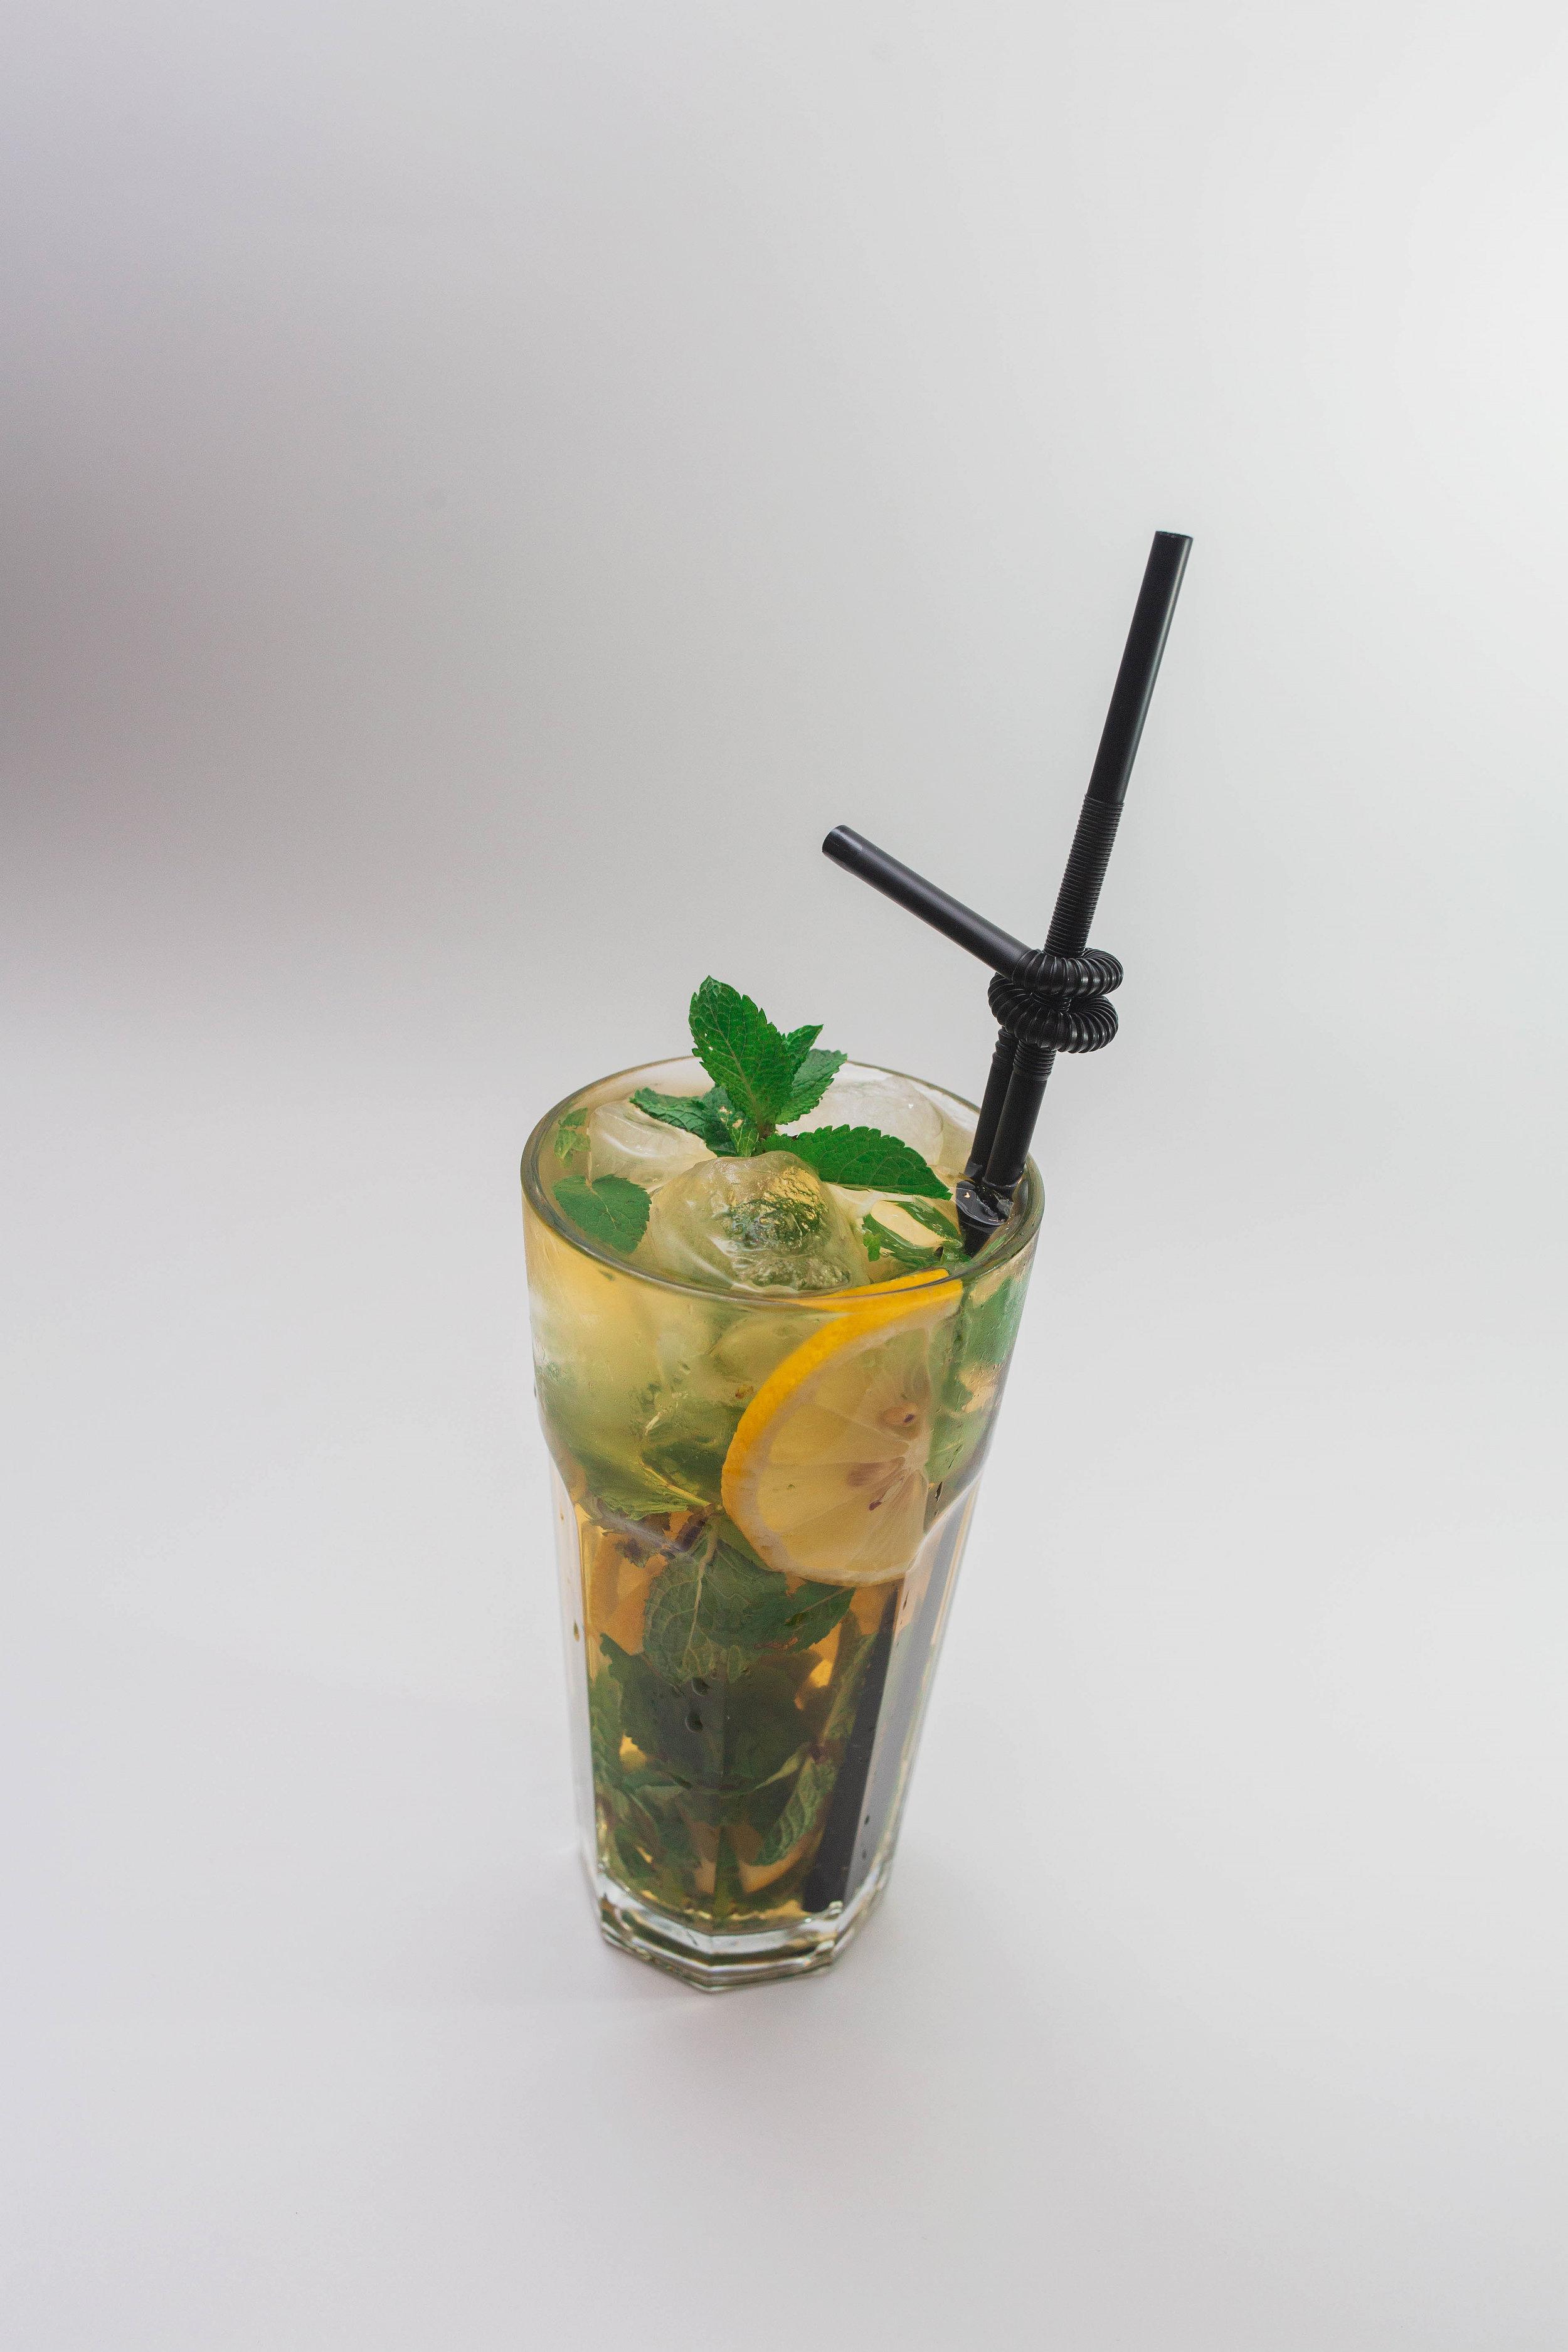 Iced Tea - Black / Green / Berry0.3 / 1.0160 kgs / 330 kgs